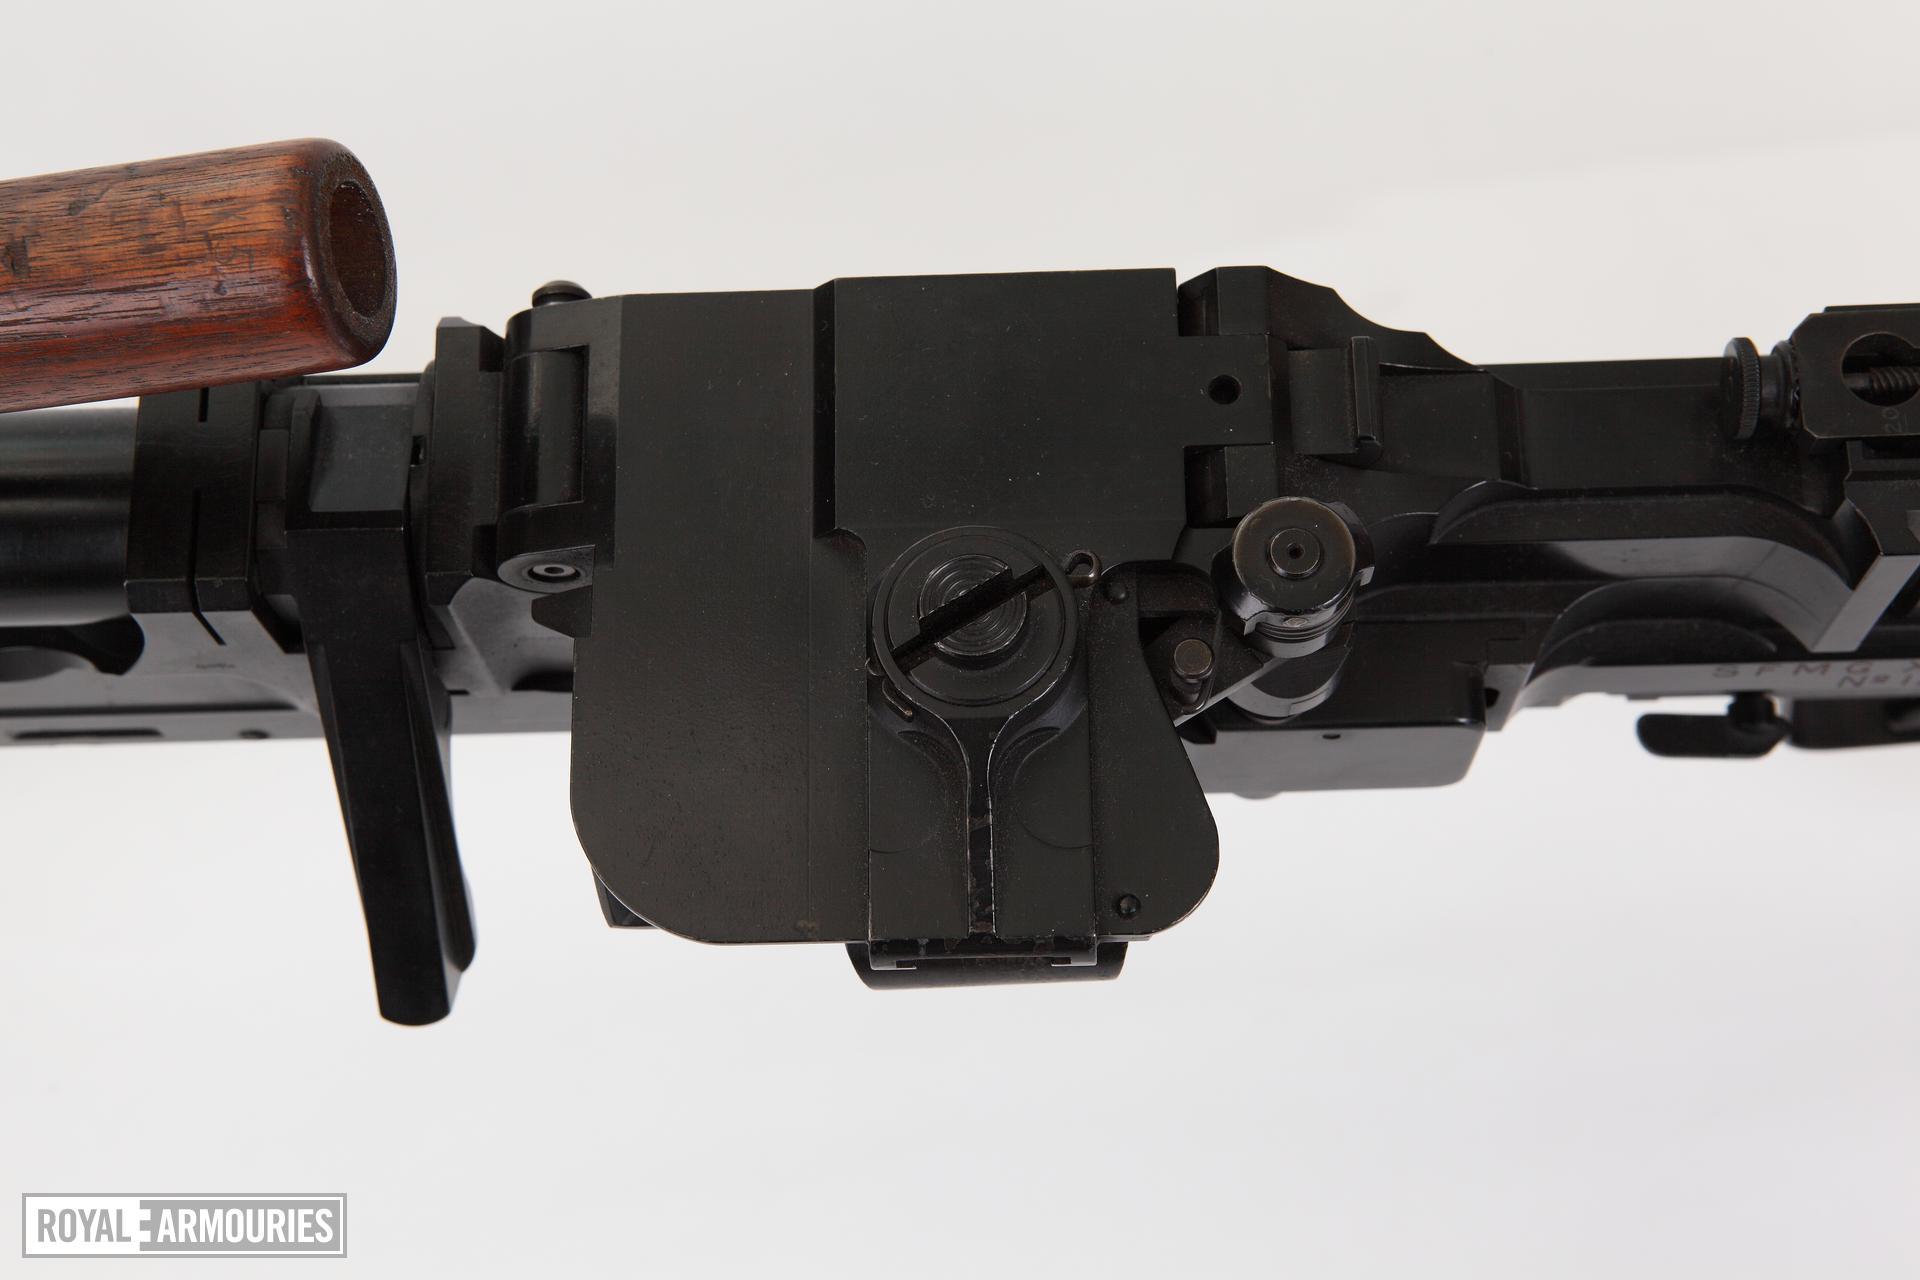 Centrefire automatic machine gun - SFMG Turpin X11E4 Experimental